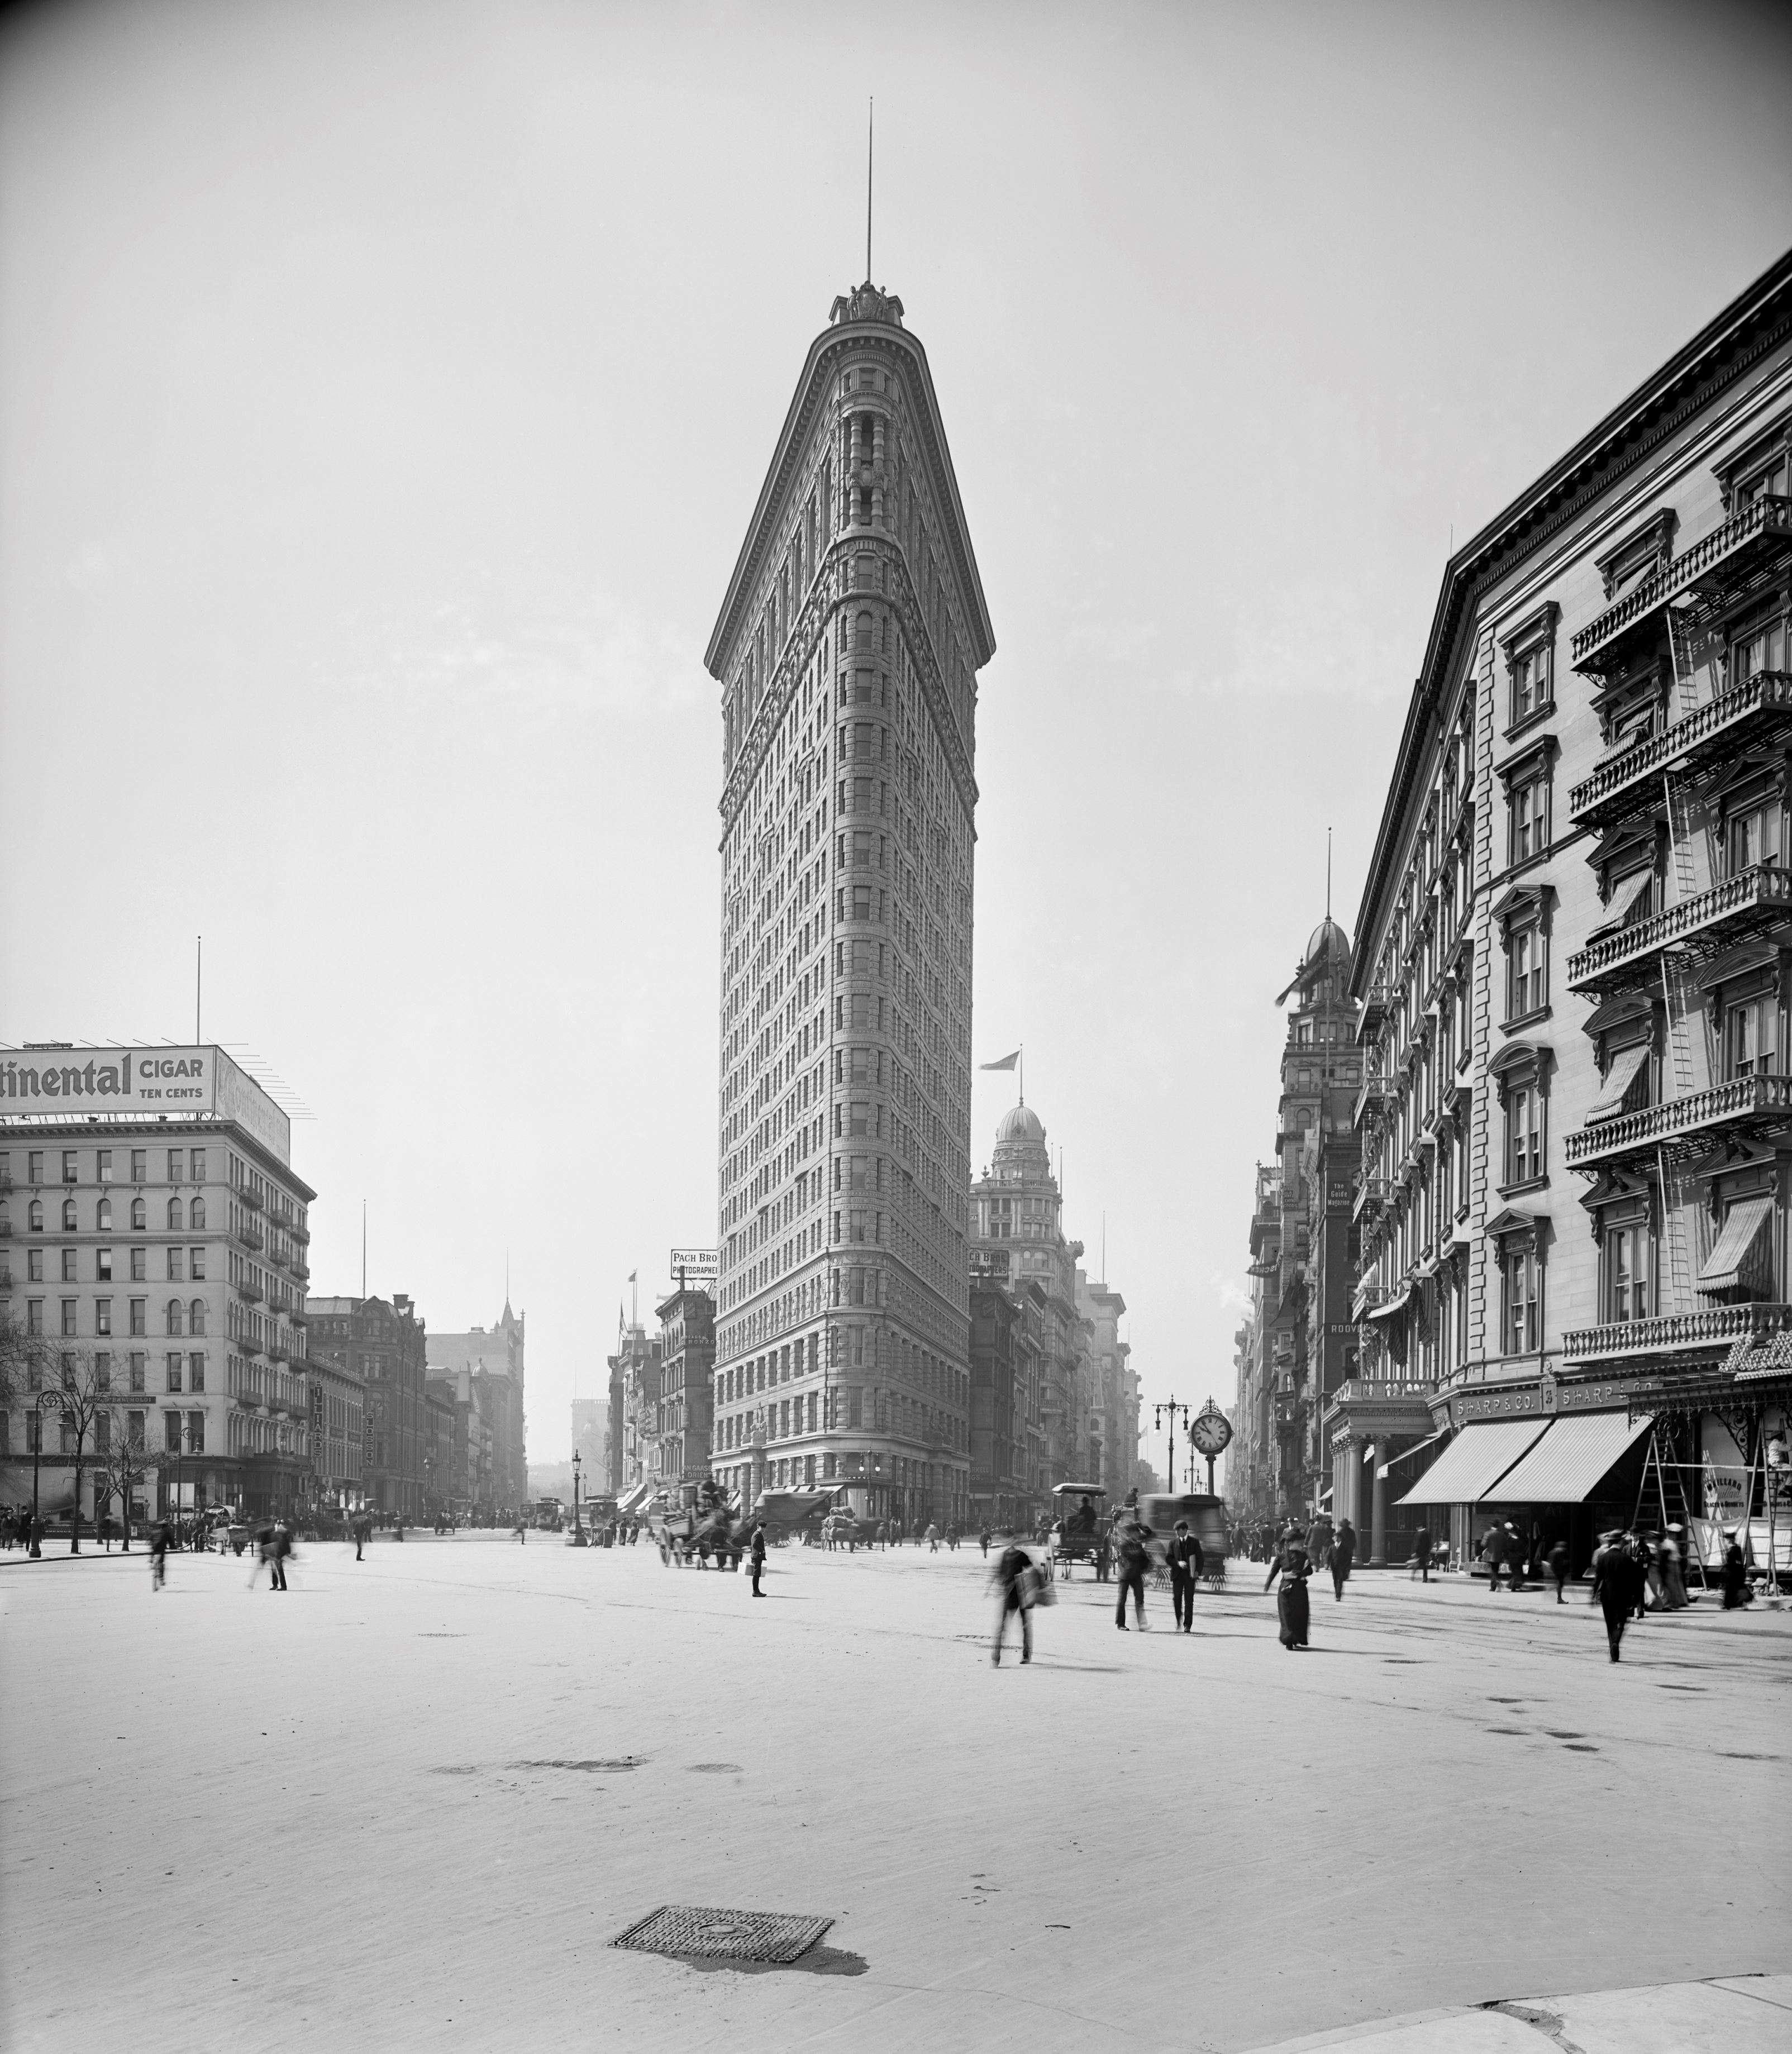 Slide 23 of 55: Flatiron Building, New York City, New York, USA, Detroit Publishing Company, 1902. (Photo by: Universal History Archive/UIG via Getty Images)